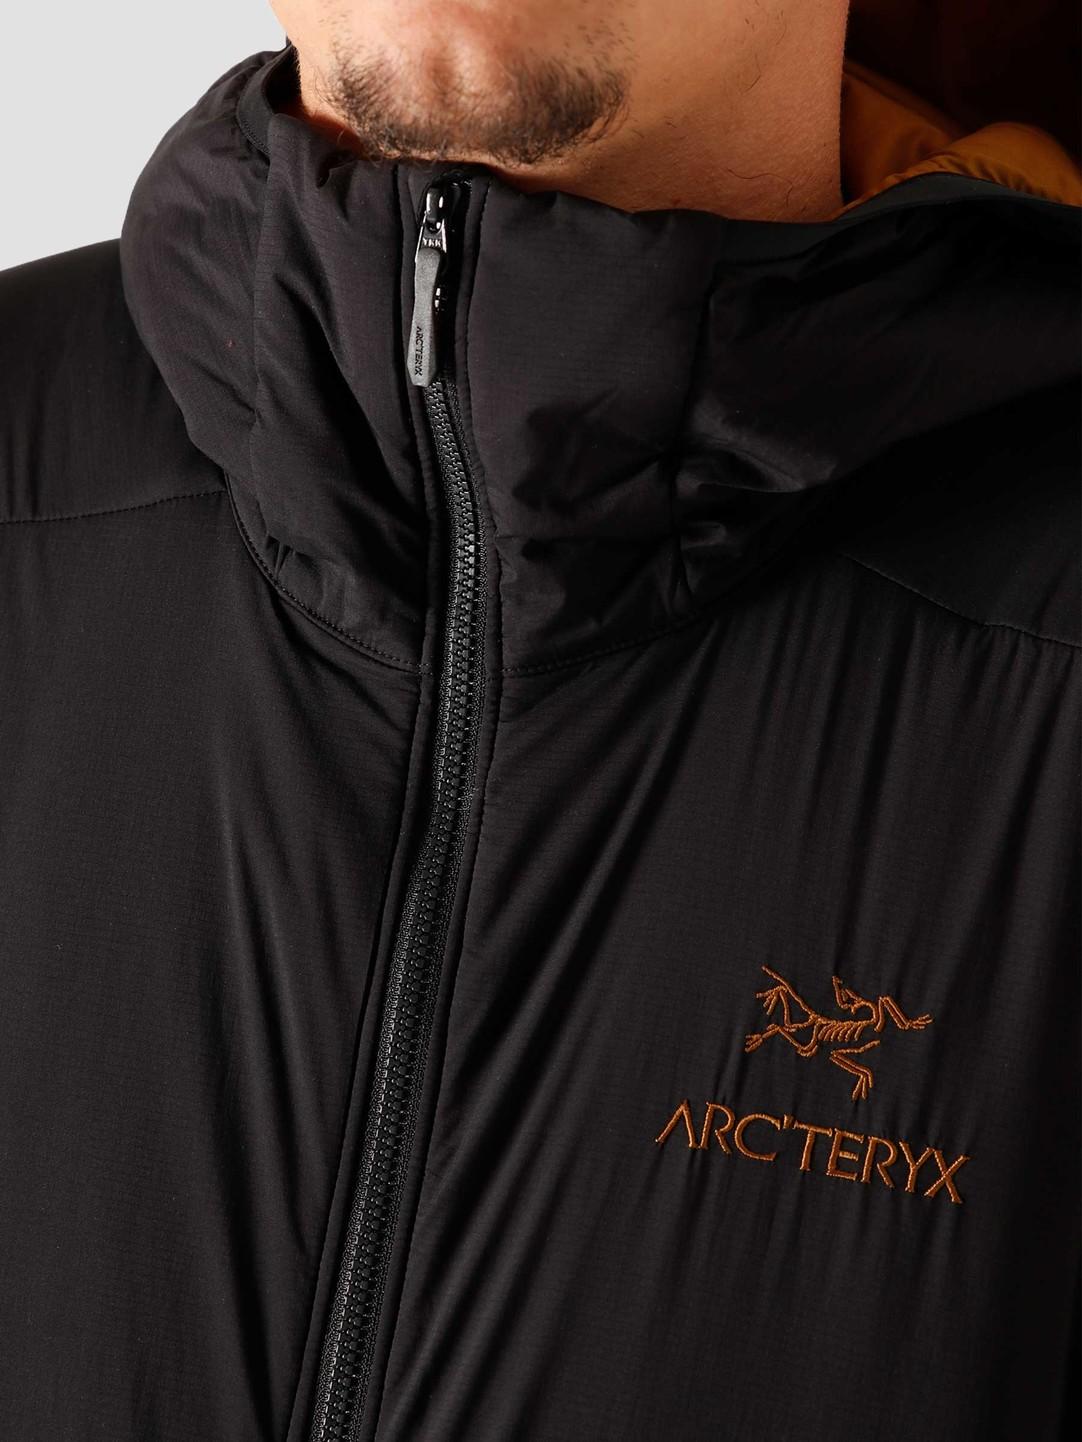 Arc'teryx Arc'teryx Atom LT Hoodie 24K Black 24108